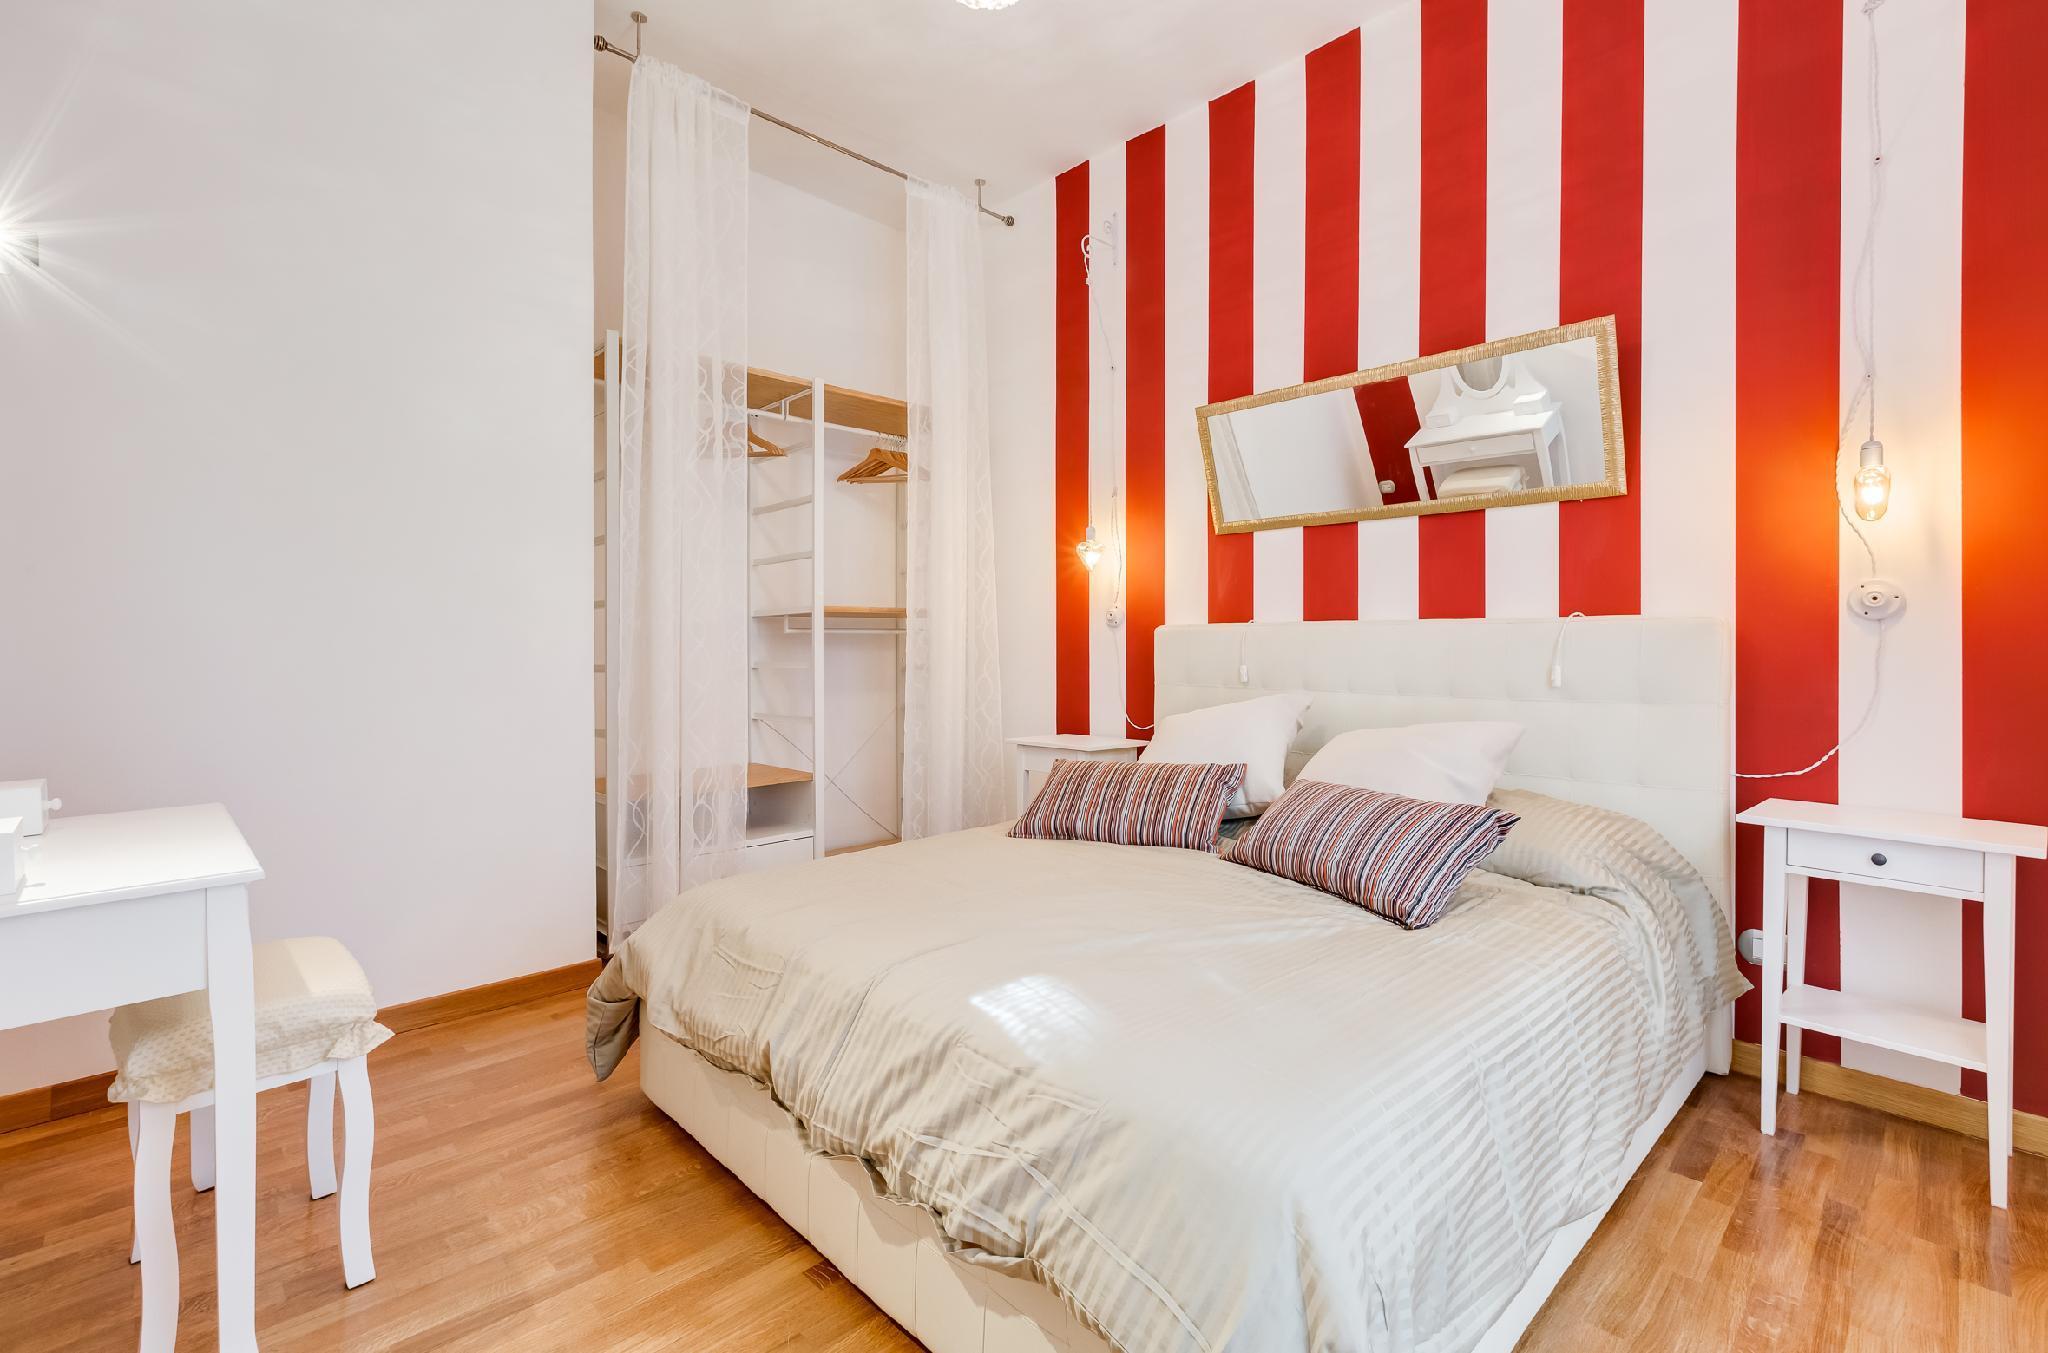 San Cosimato House in Trastevere